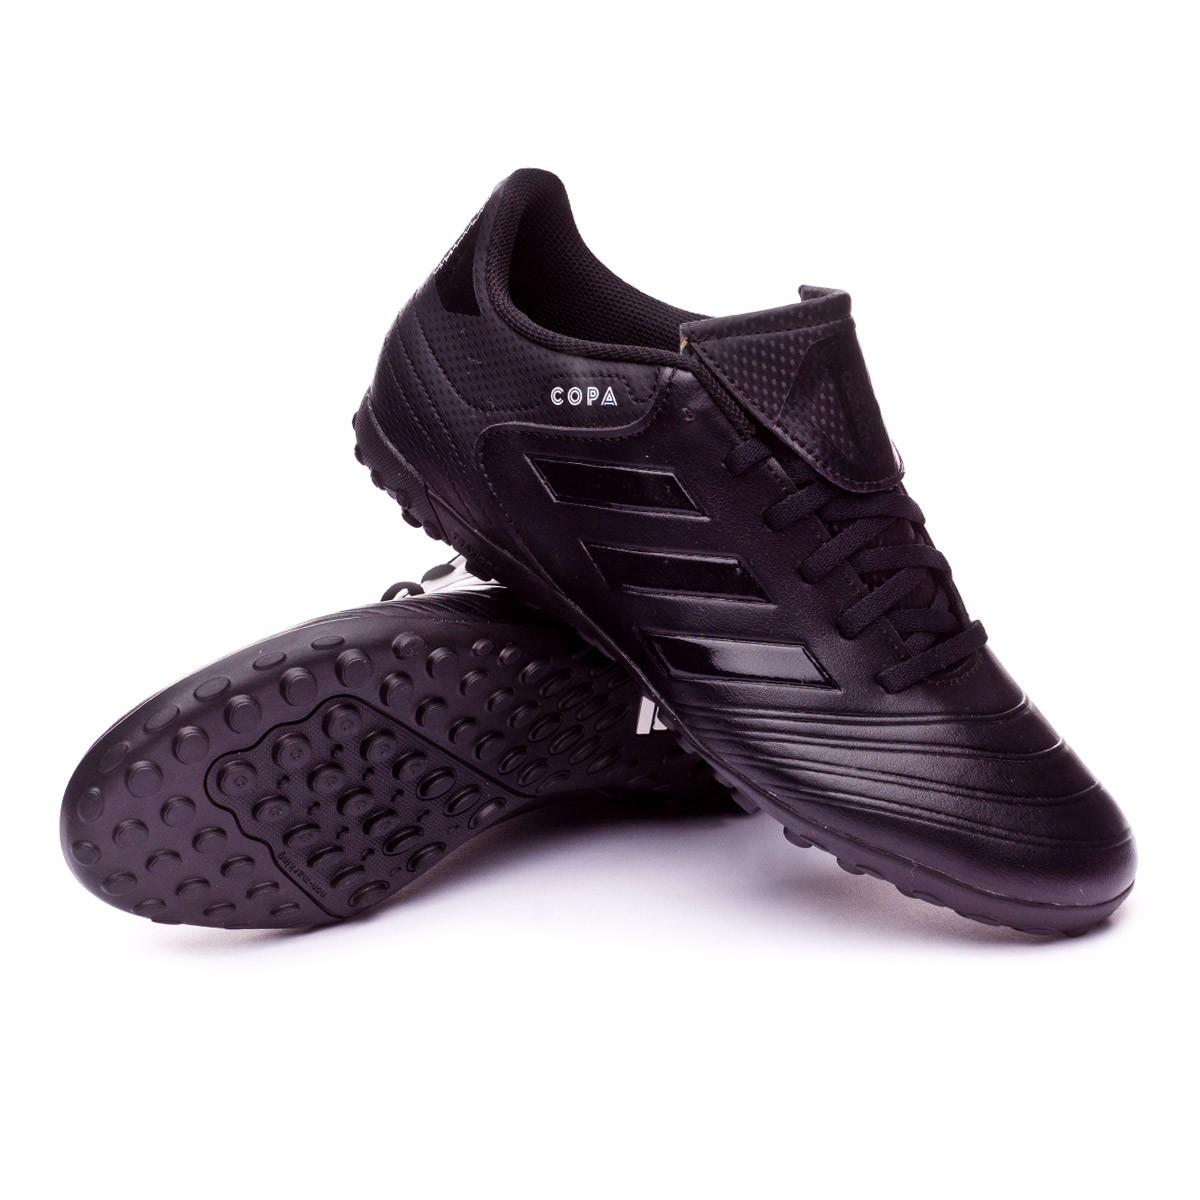 Scarpe adidas Copa Tango 18.4 Turf